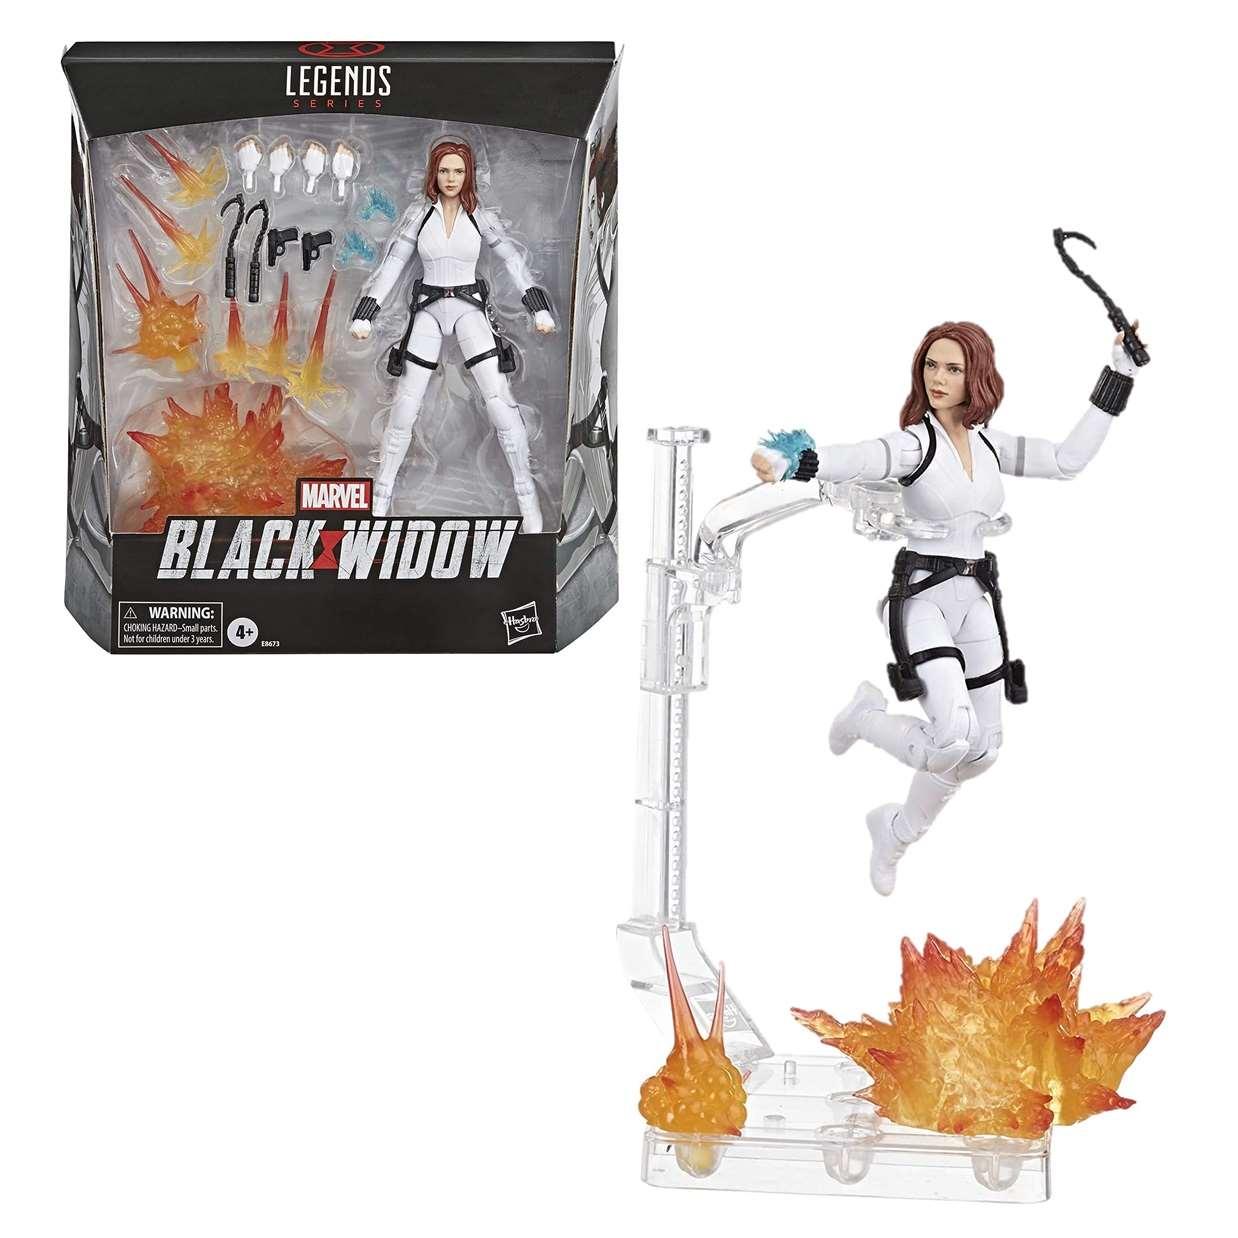 Black Widow Figura Marvel Black Widow Legends Series 6 PuLG